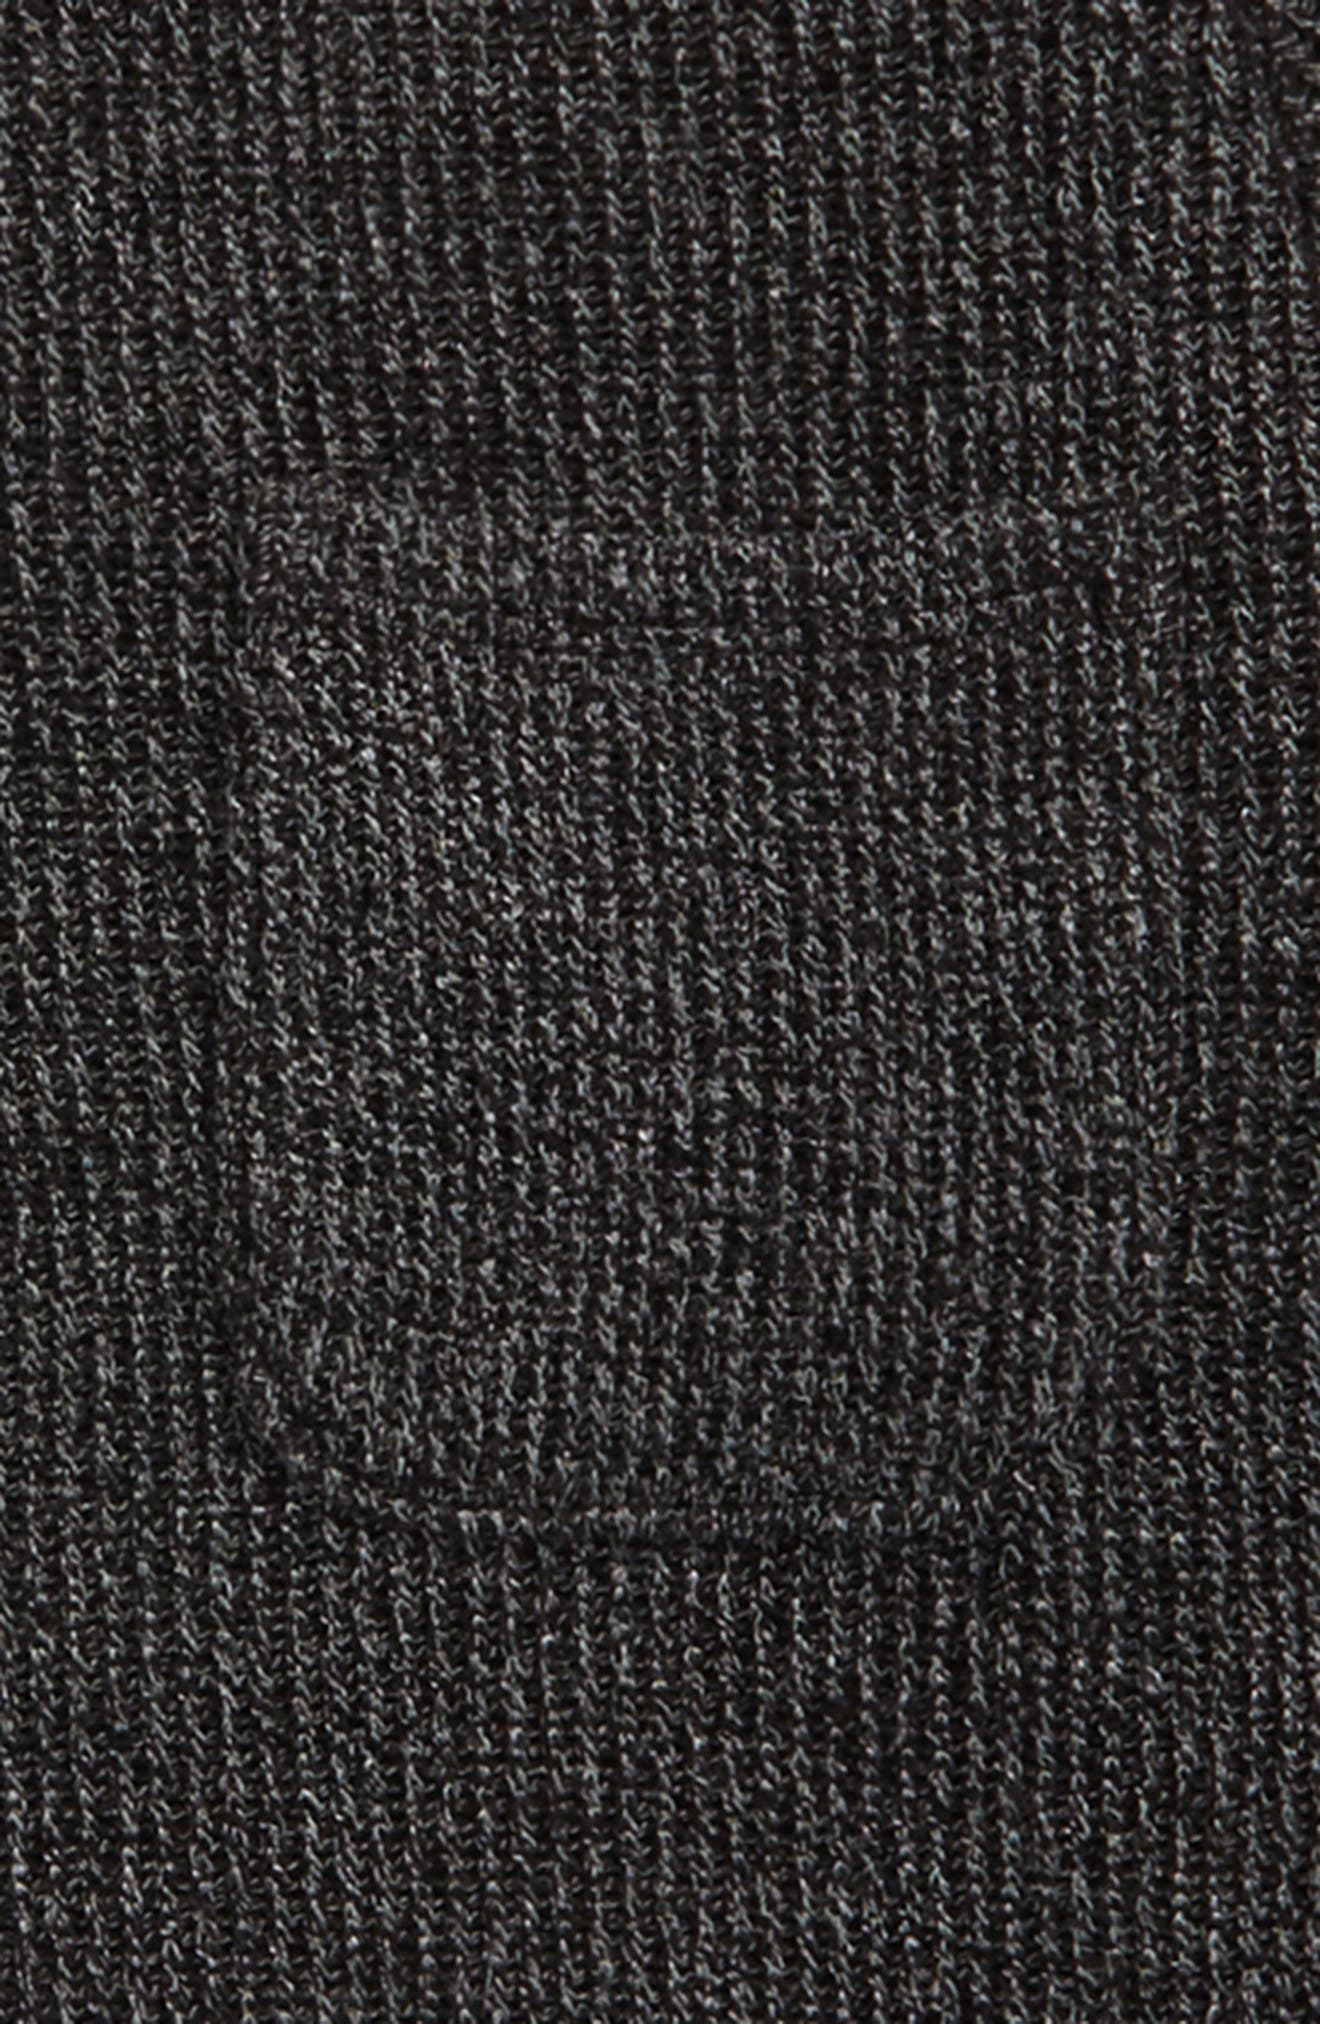 Raglan Pocket Sweater,                             Alternate thumbnail 2, color,                             001